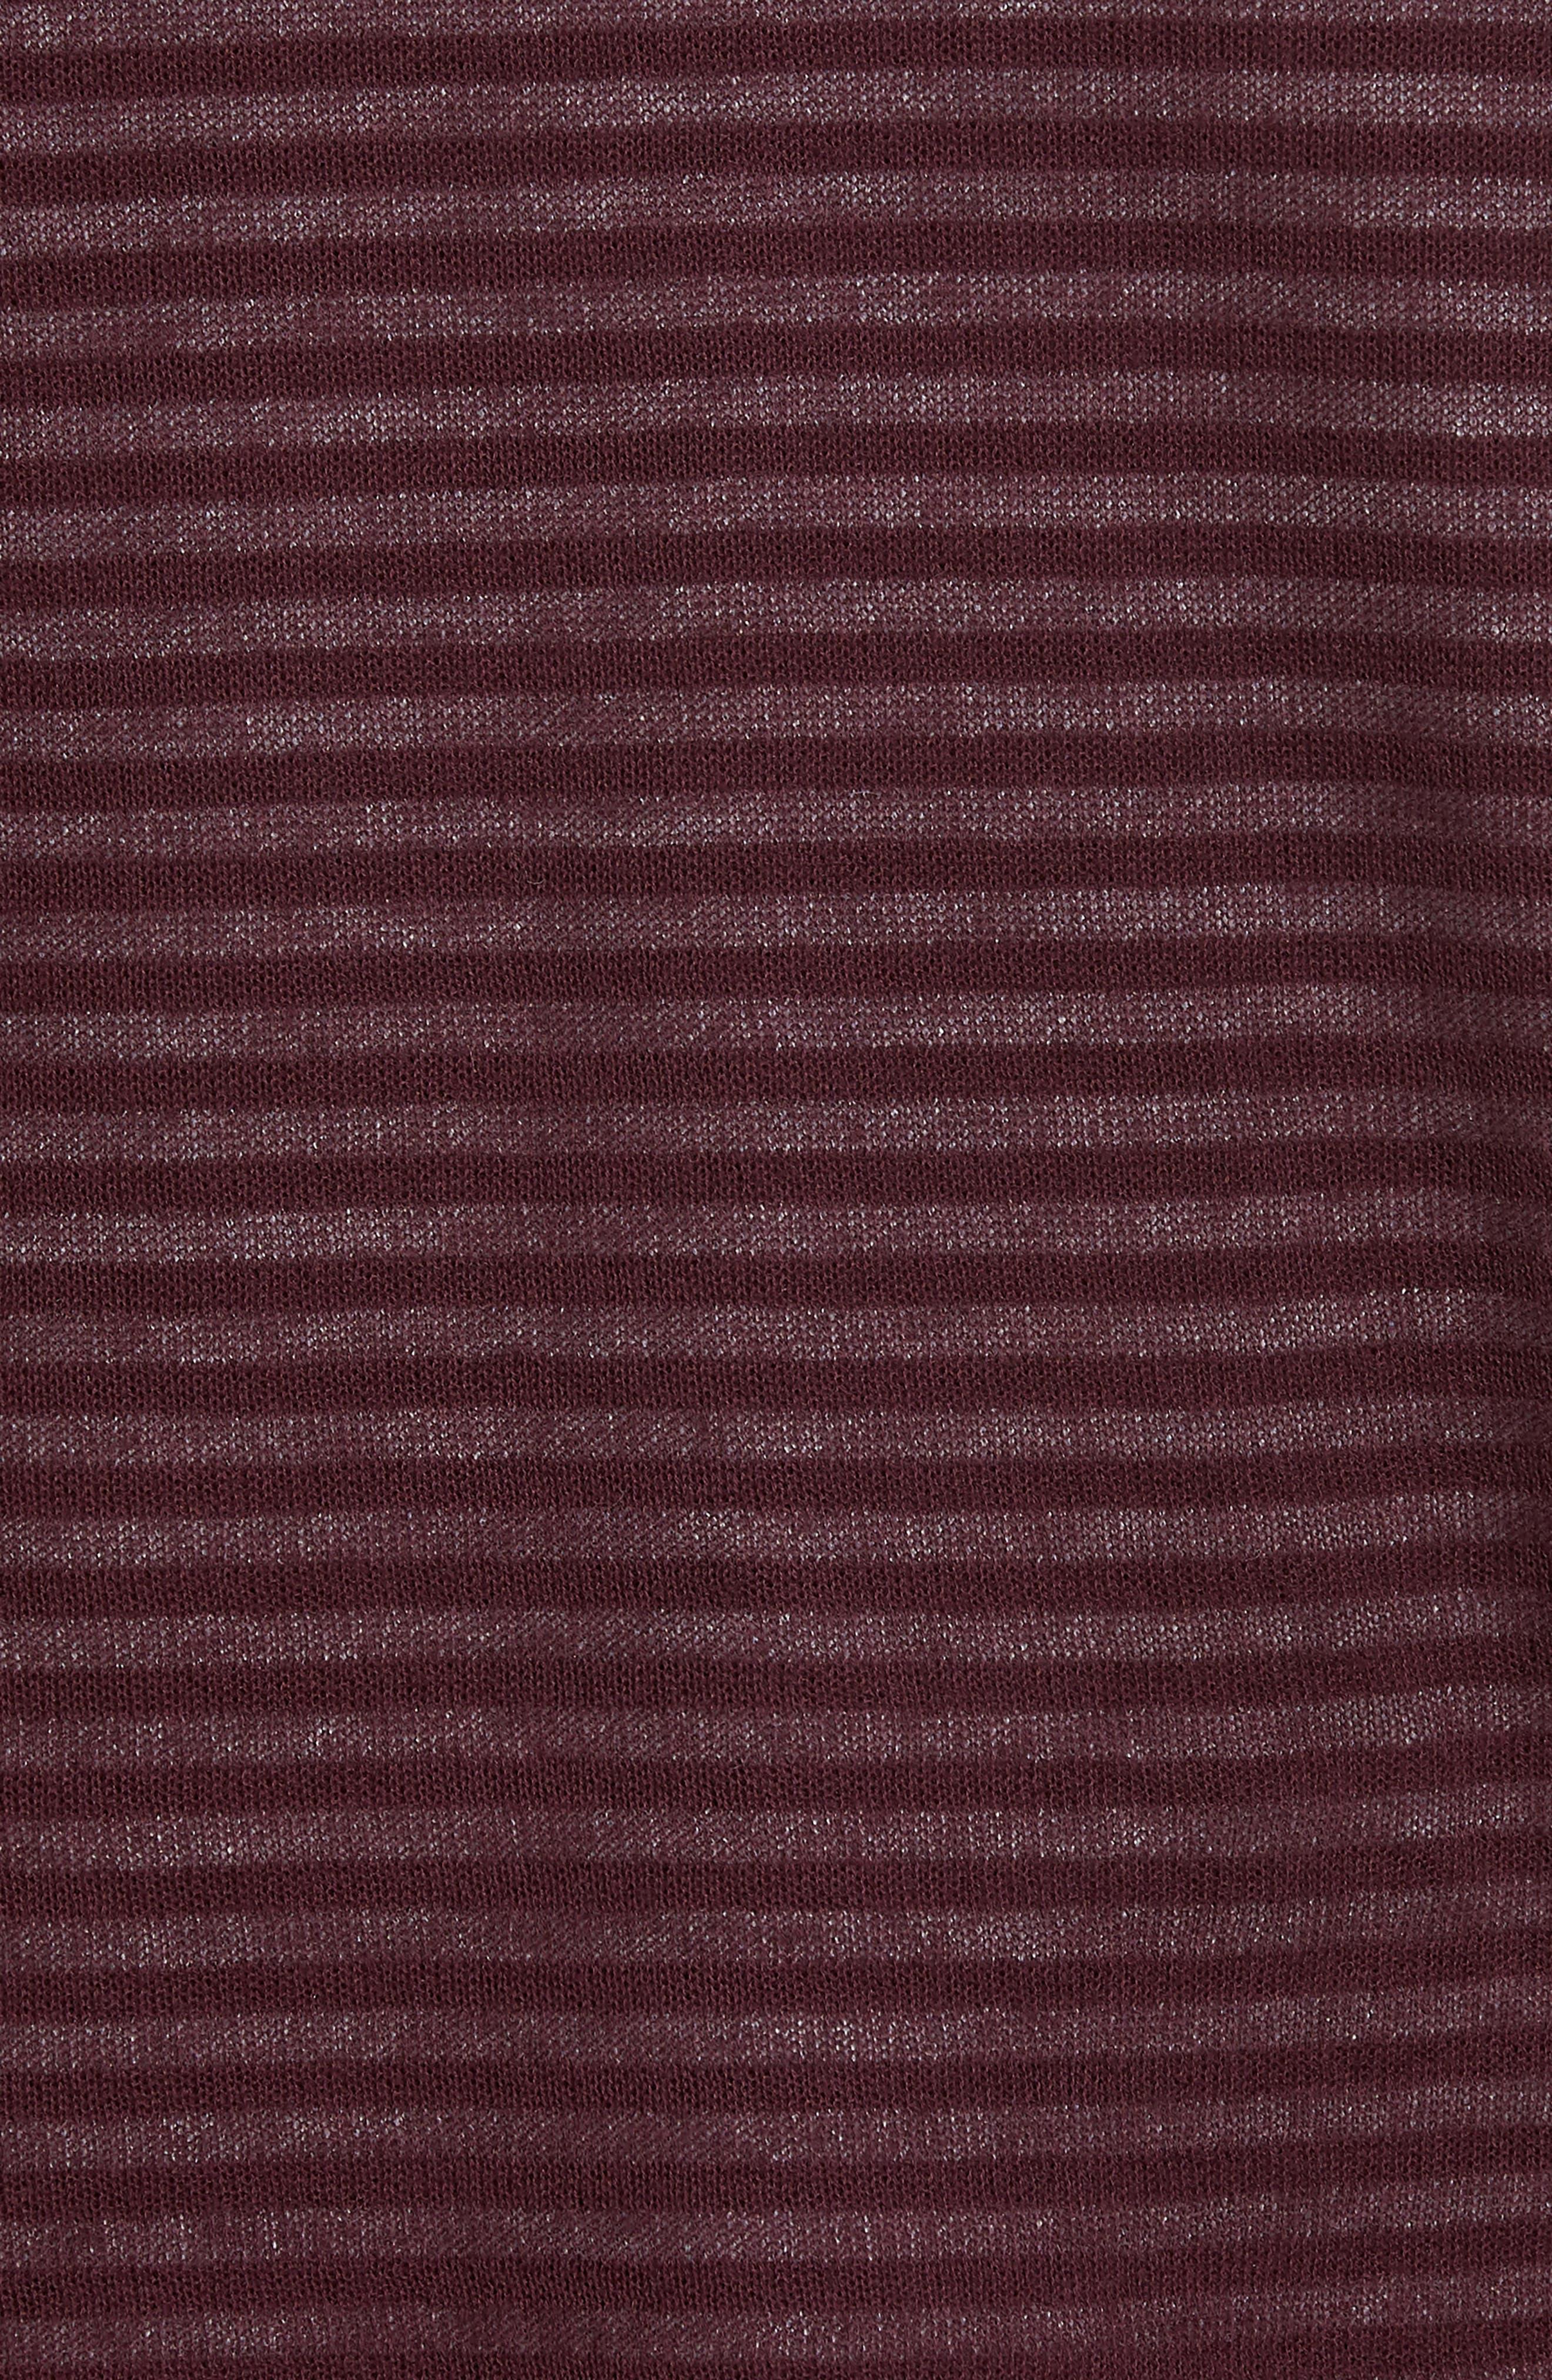 Stripe V-Neck Double Layer Sweater,                             Alternate thumbnail 5, color,                             Burgundy Stem Stripe